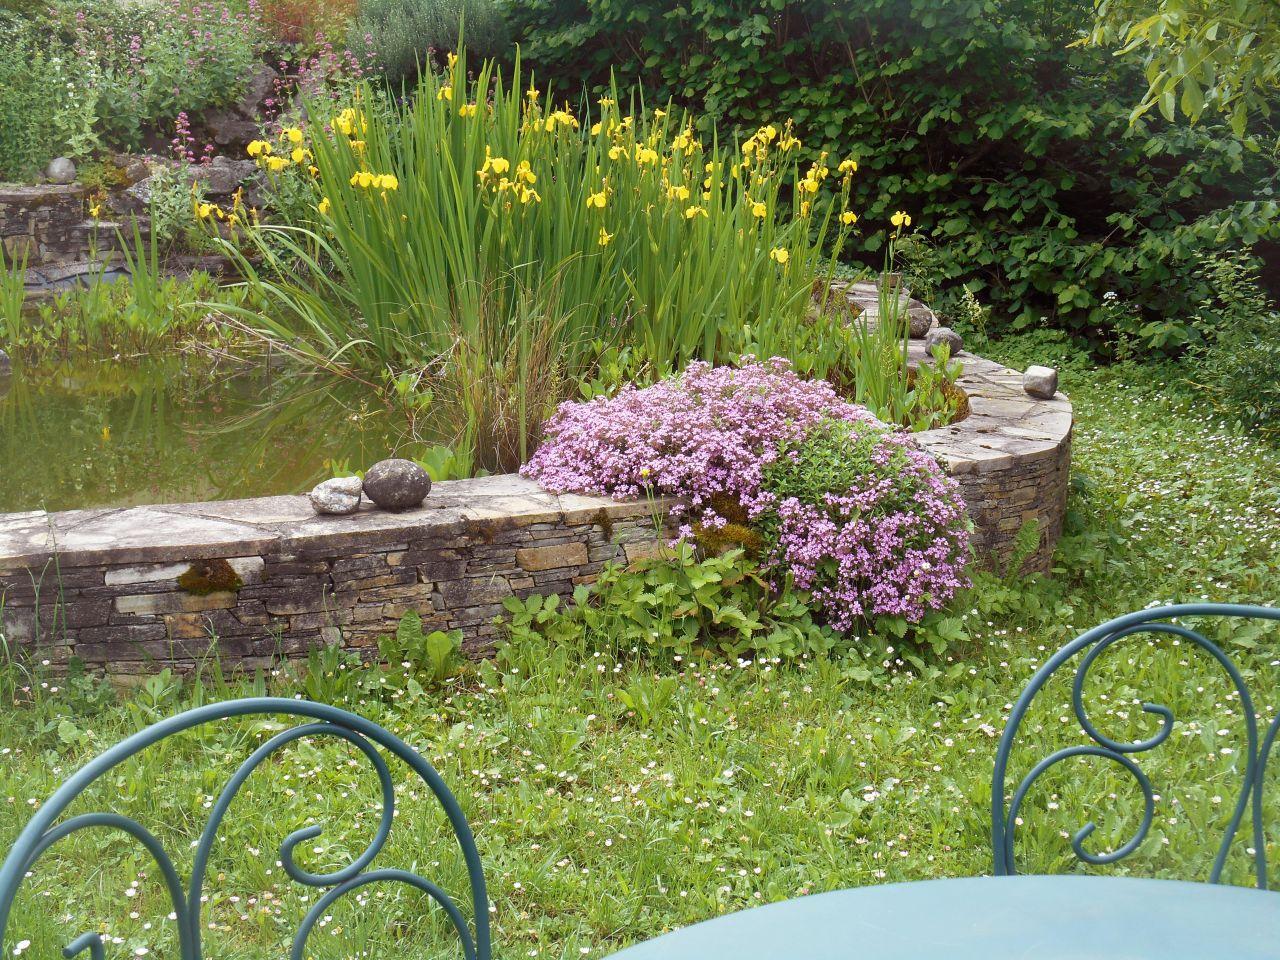 R verie au jardin haute savoie for Andy tauer reverie au jardin